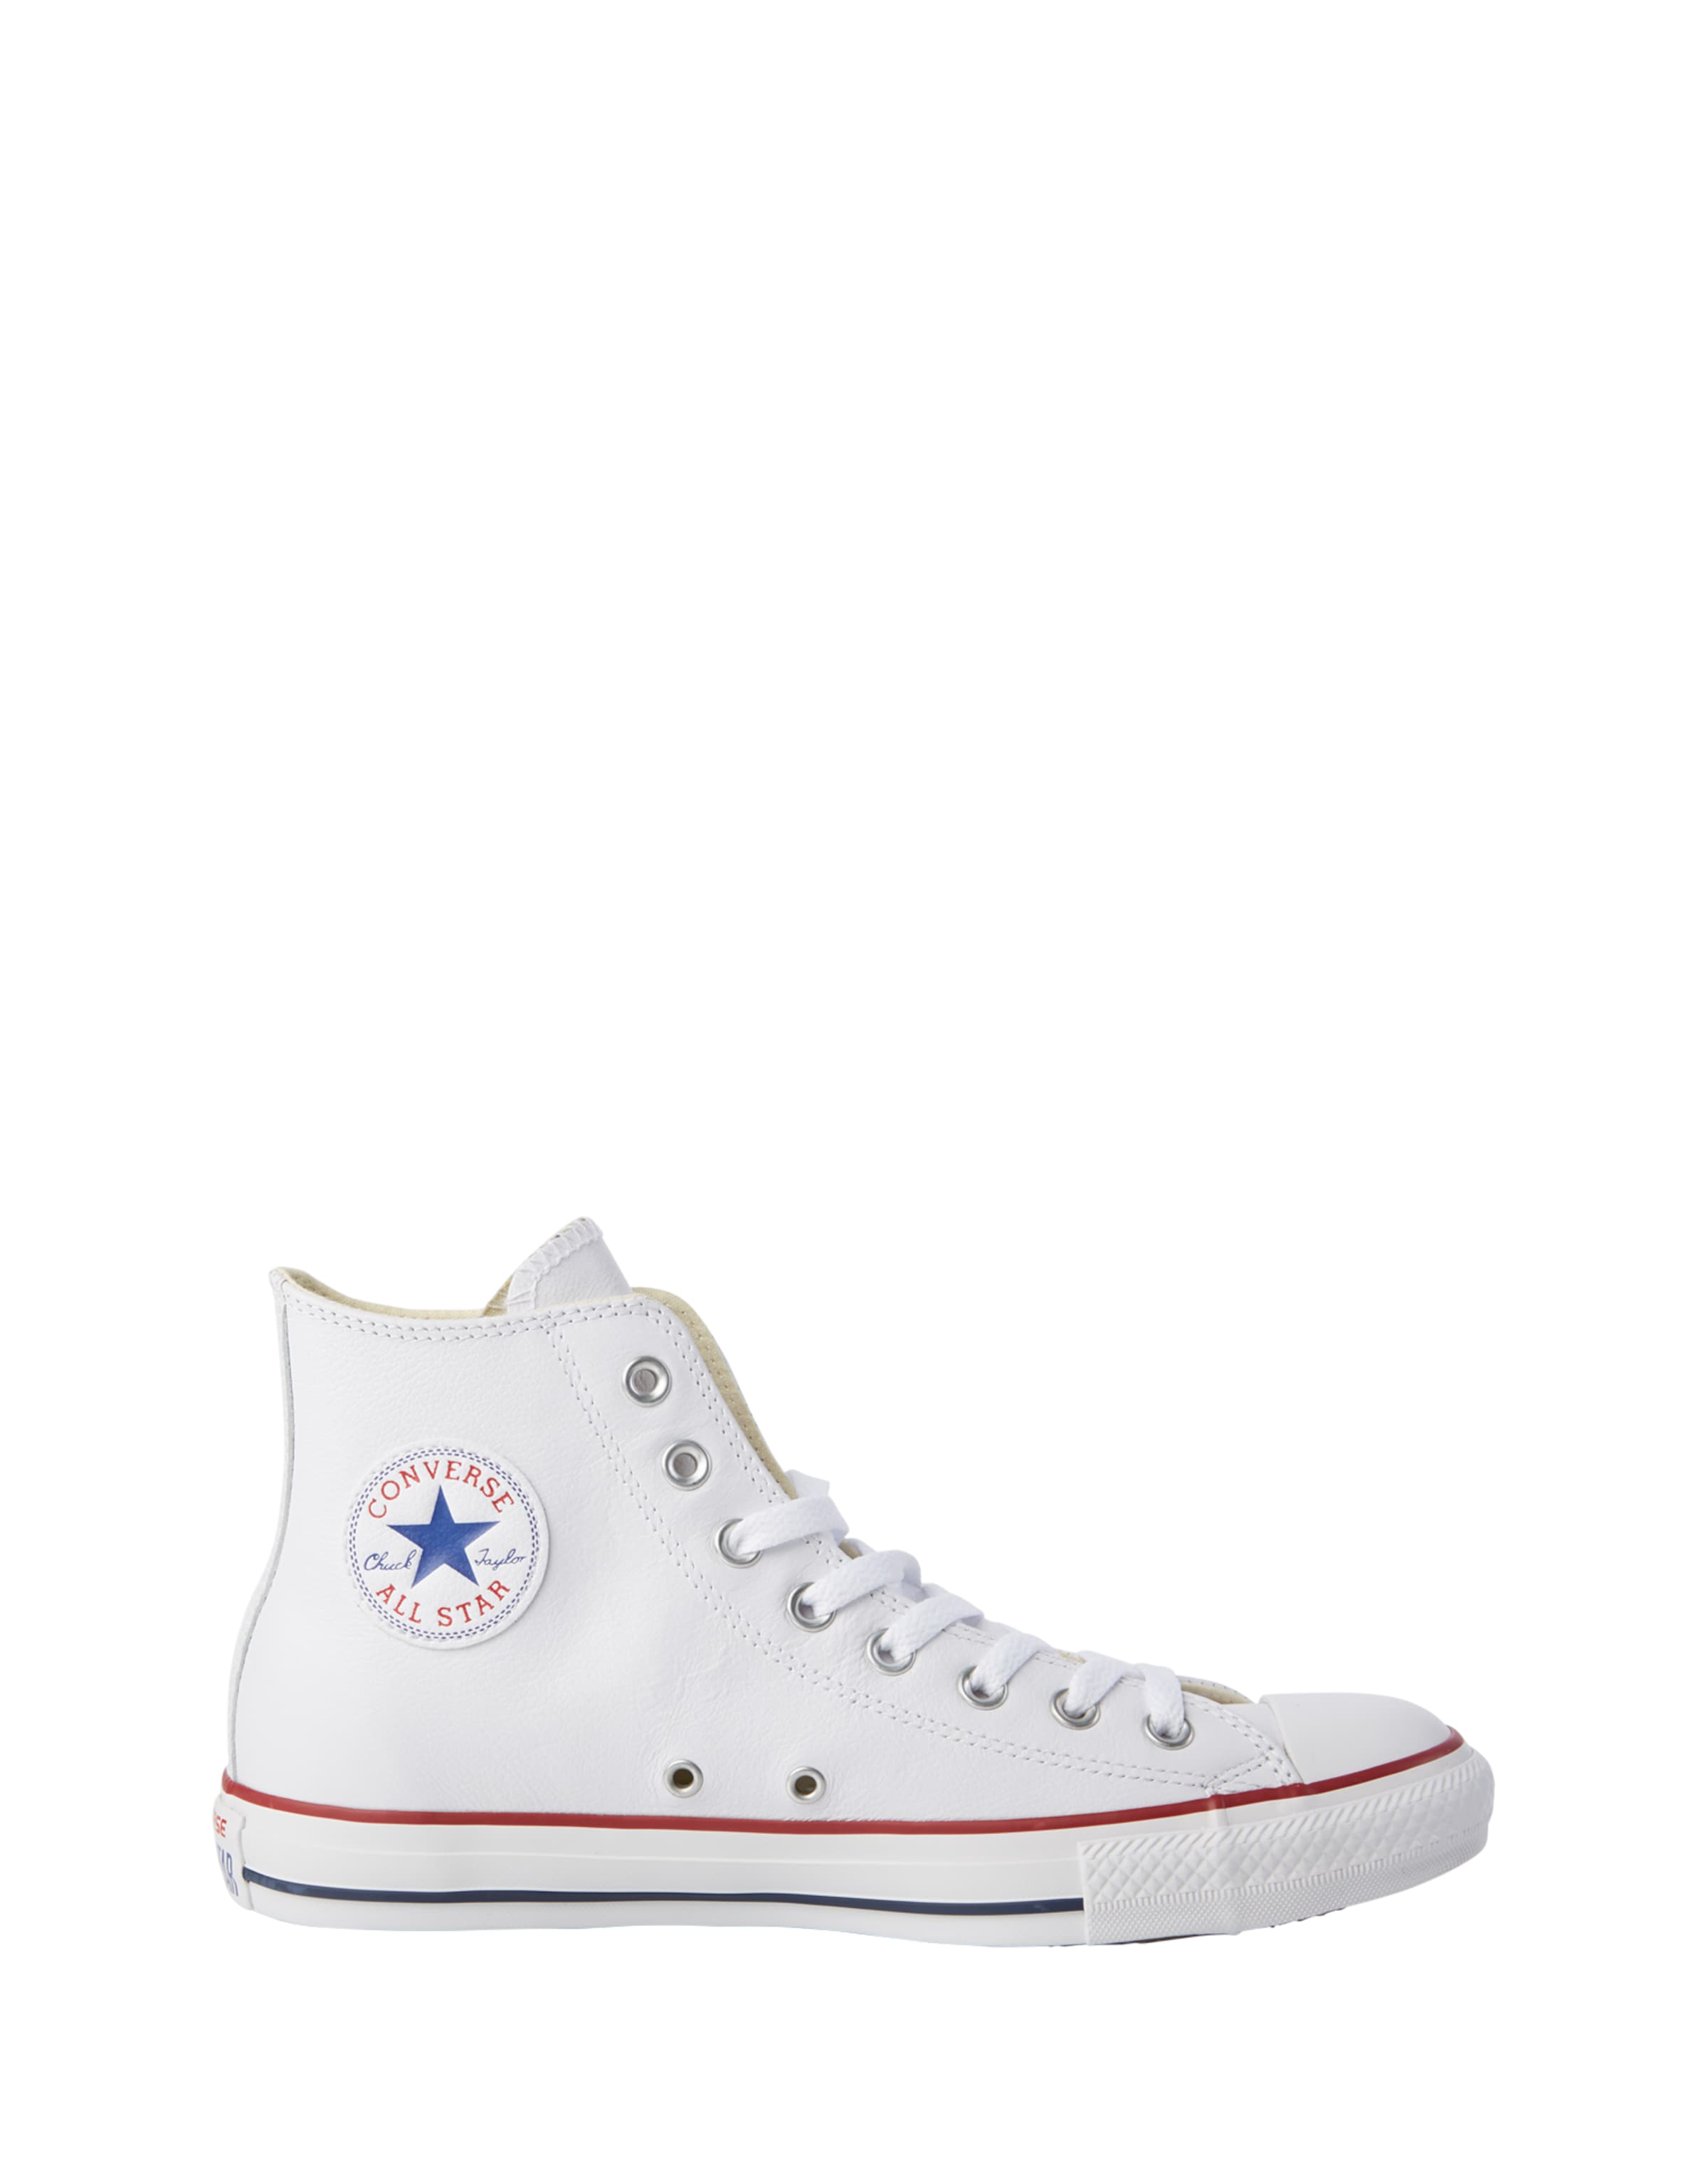 Converse Star' ChinéNoir Baskets Rouge En Hautes Blanc 'all IY7fgybm6v